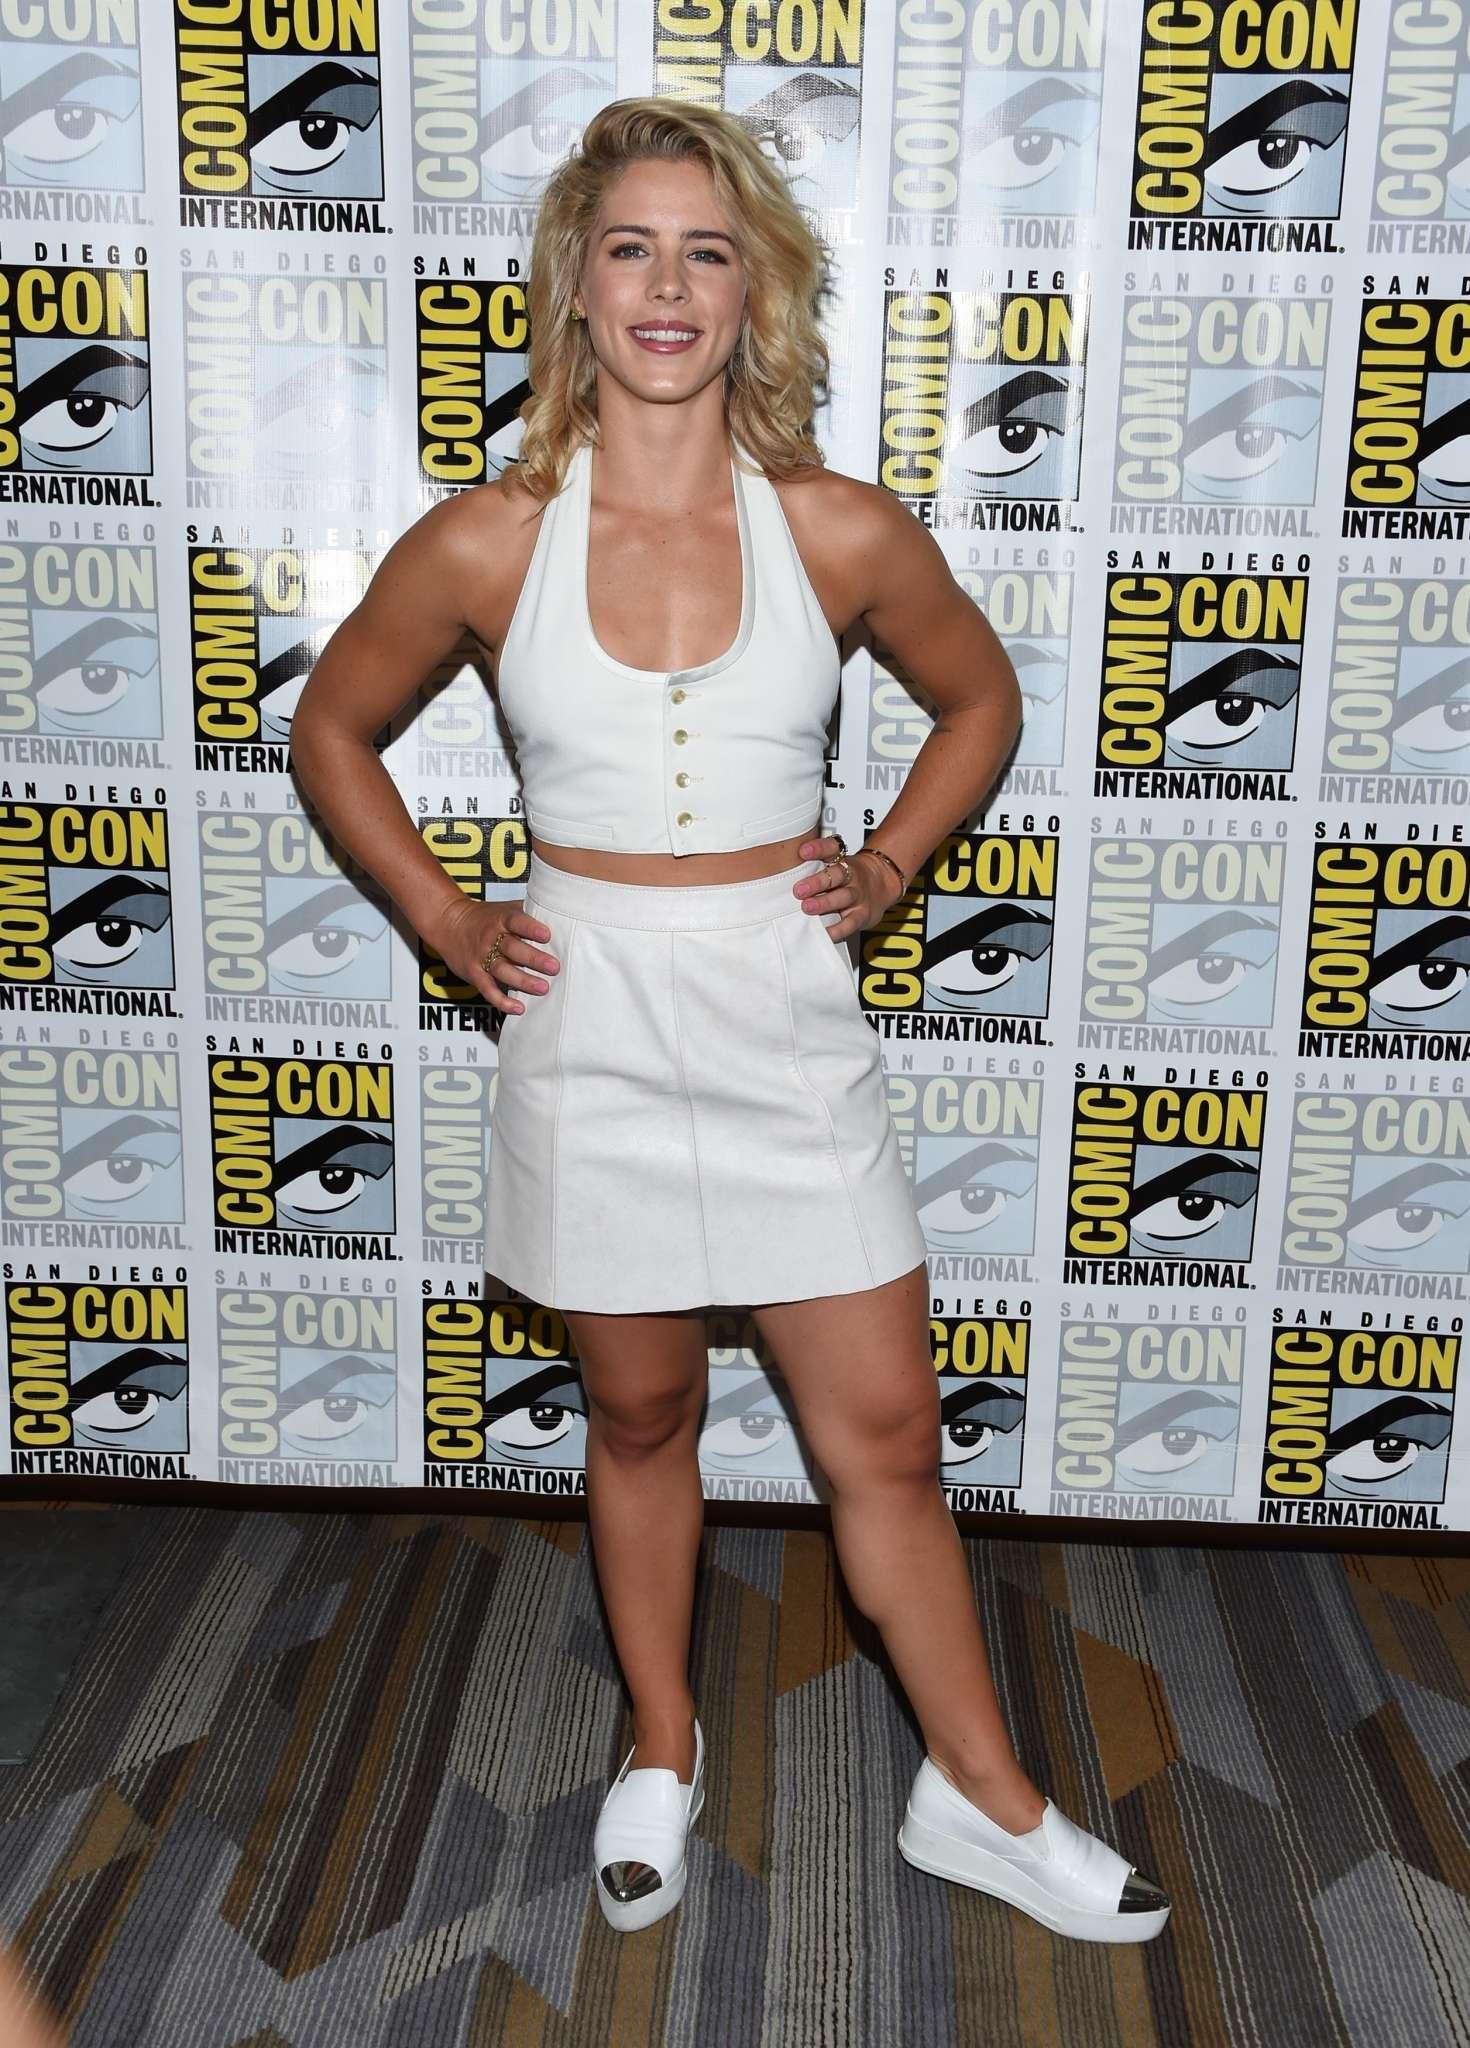 ¿Cuánto mide Emily Bett Rickards? - Real height Emily-Bett-Rickards%C2%A0--Arrow-Presentation-at-2017-Comic-Con--04